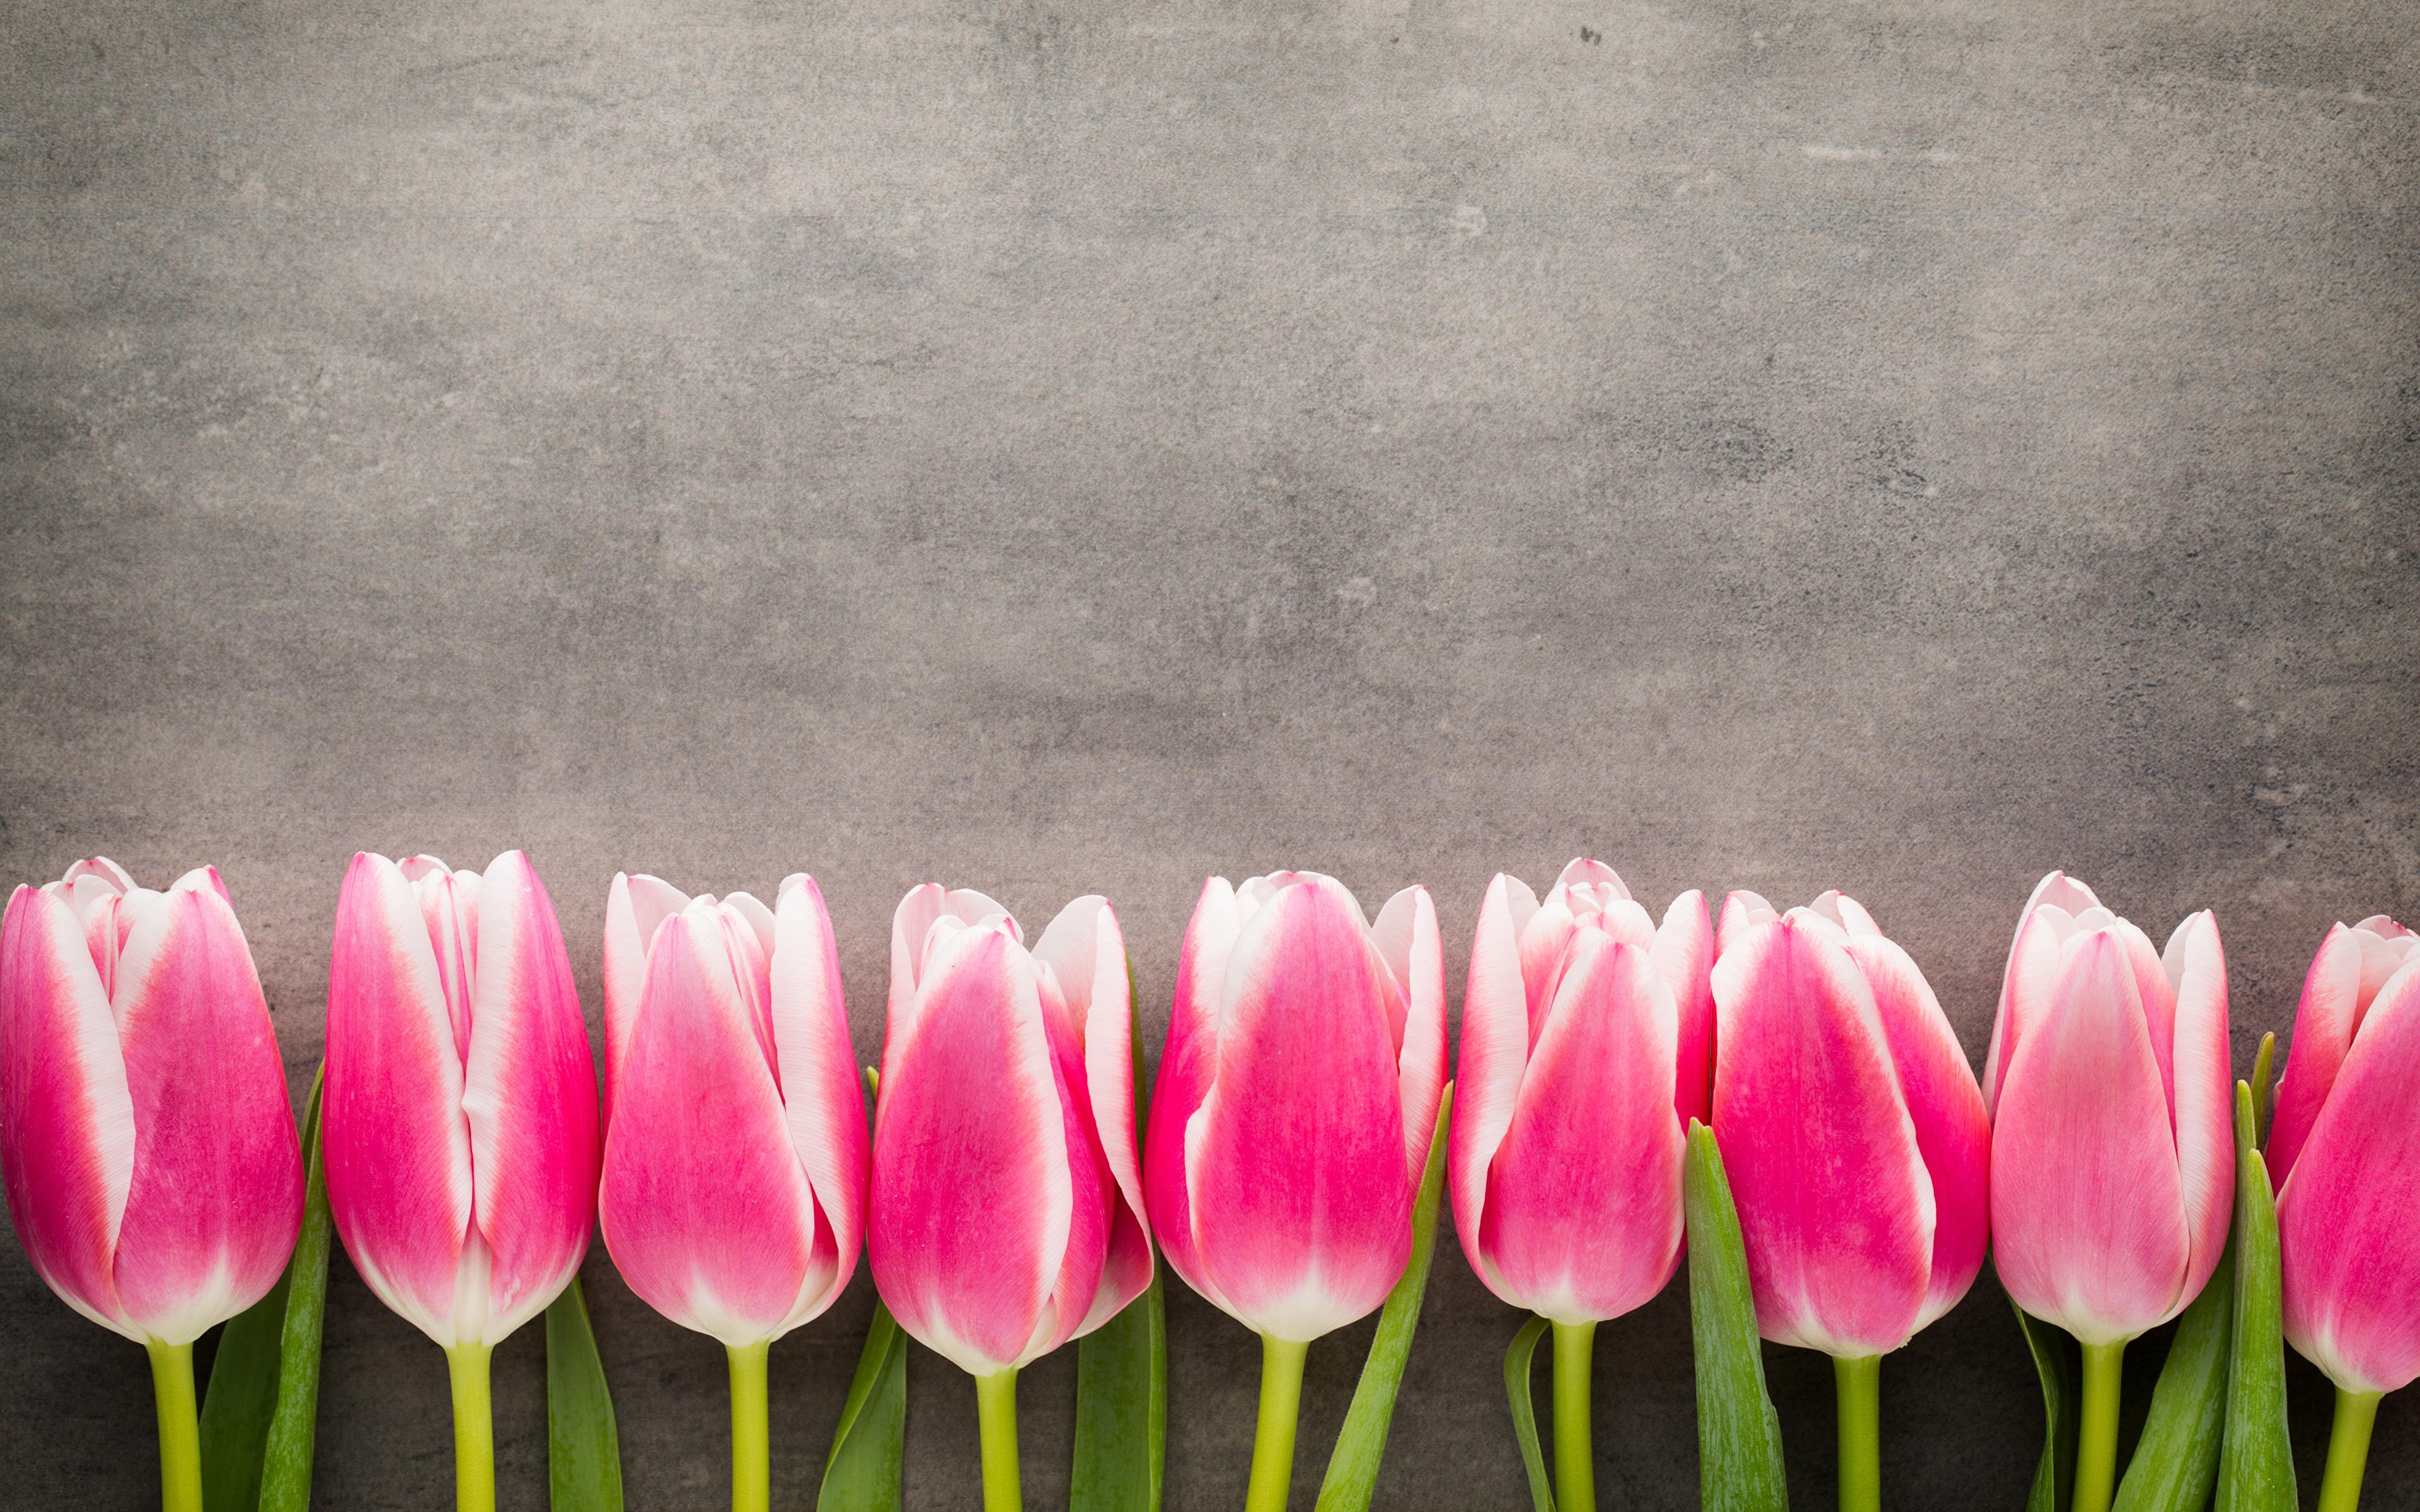 Картинка розовая Тюльпаны цветок 3840x2400 розовых розовые Розовый тюльпан Цветы